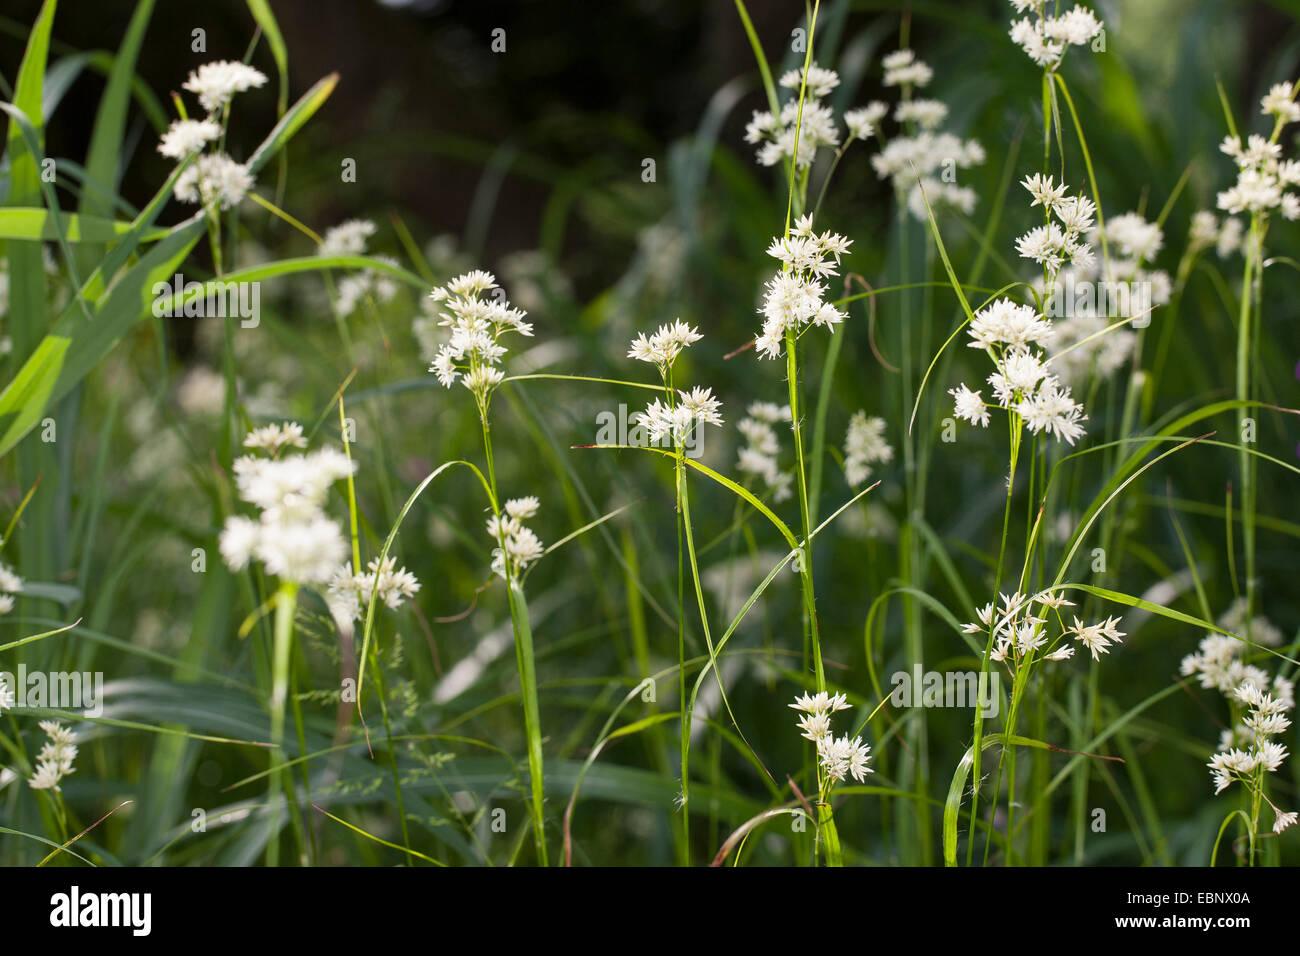 Snowy woodrush, Snowy wood sedge, Snowy wood rush (Luzula nivea), blooming, Germany Stock Photo